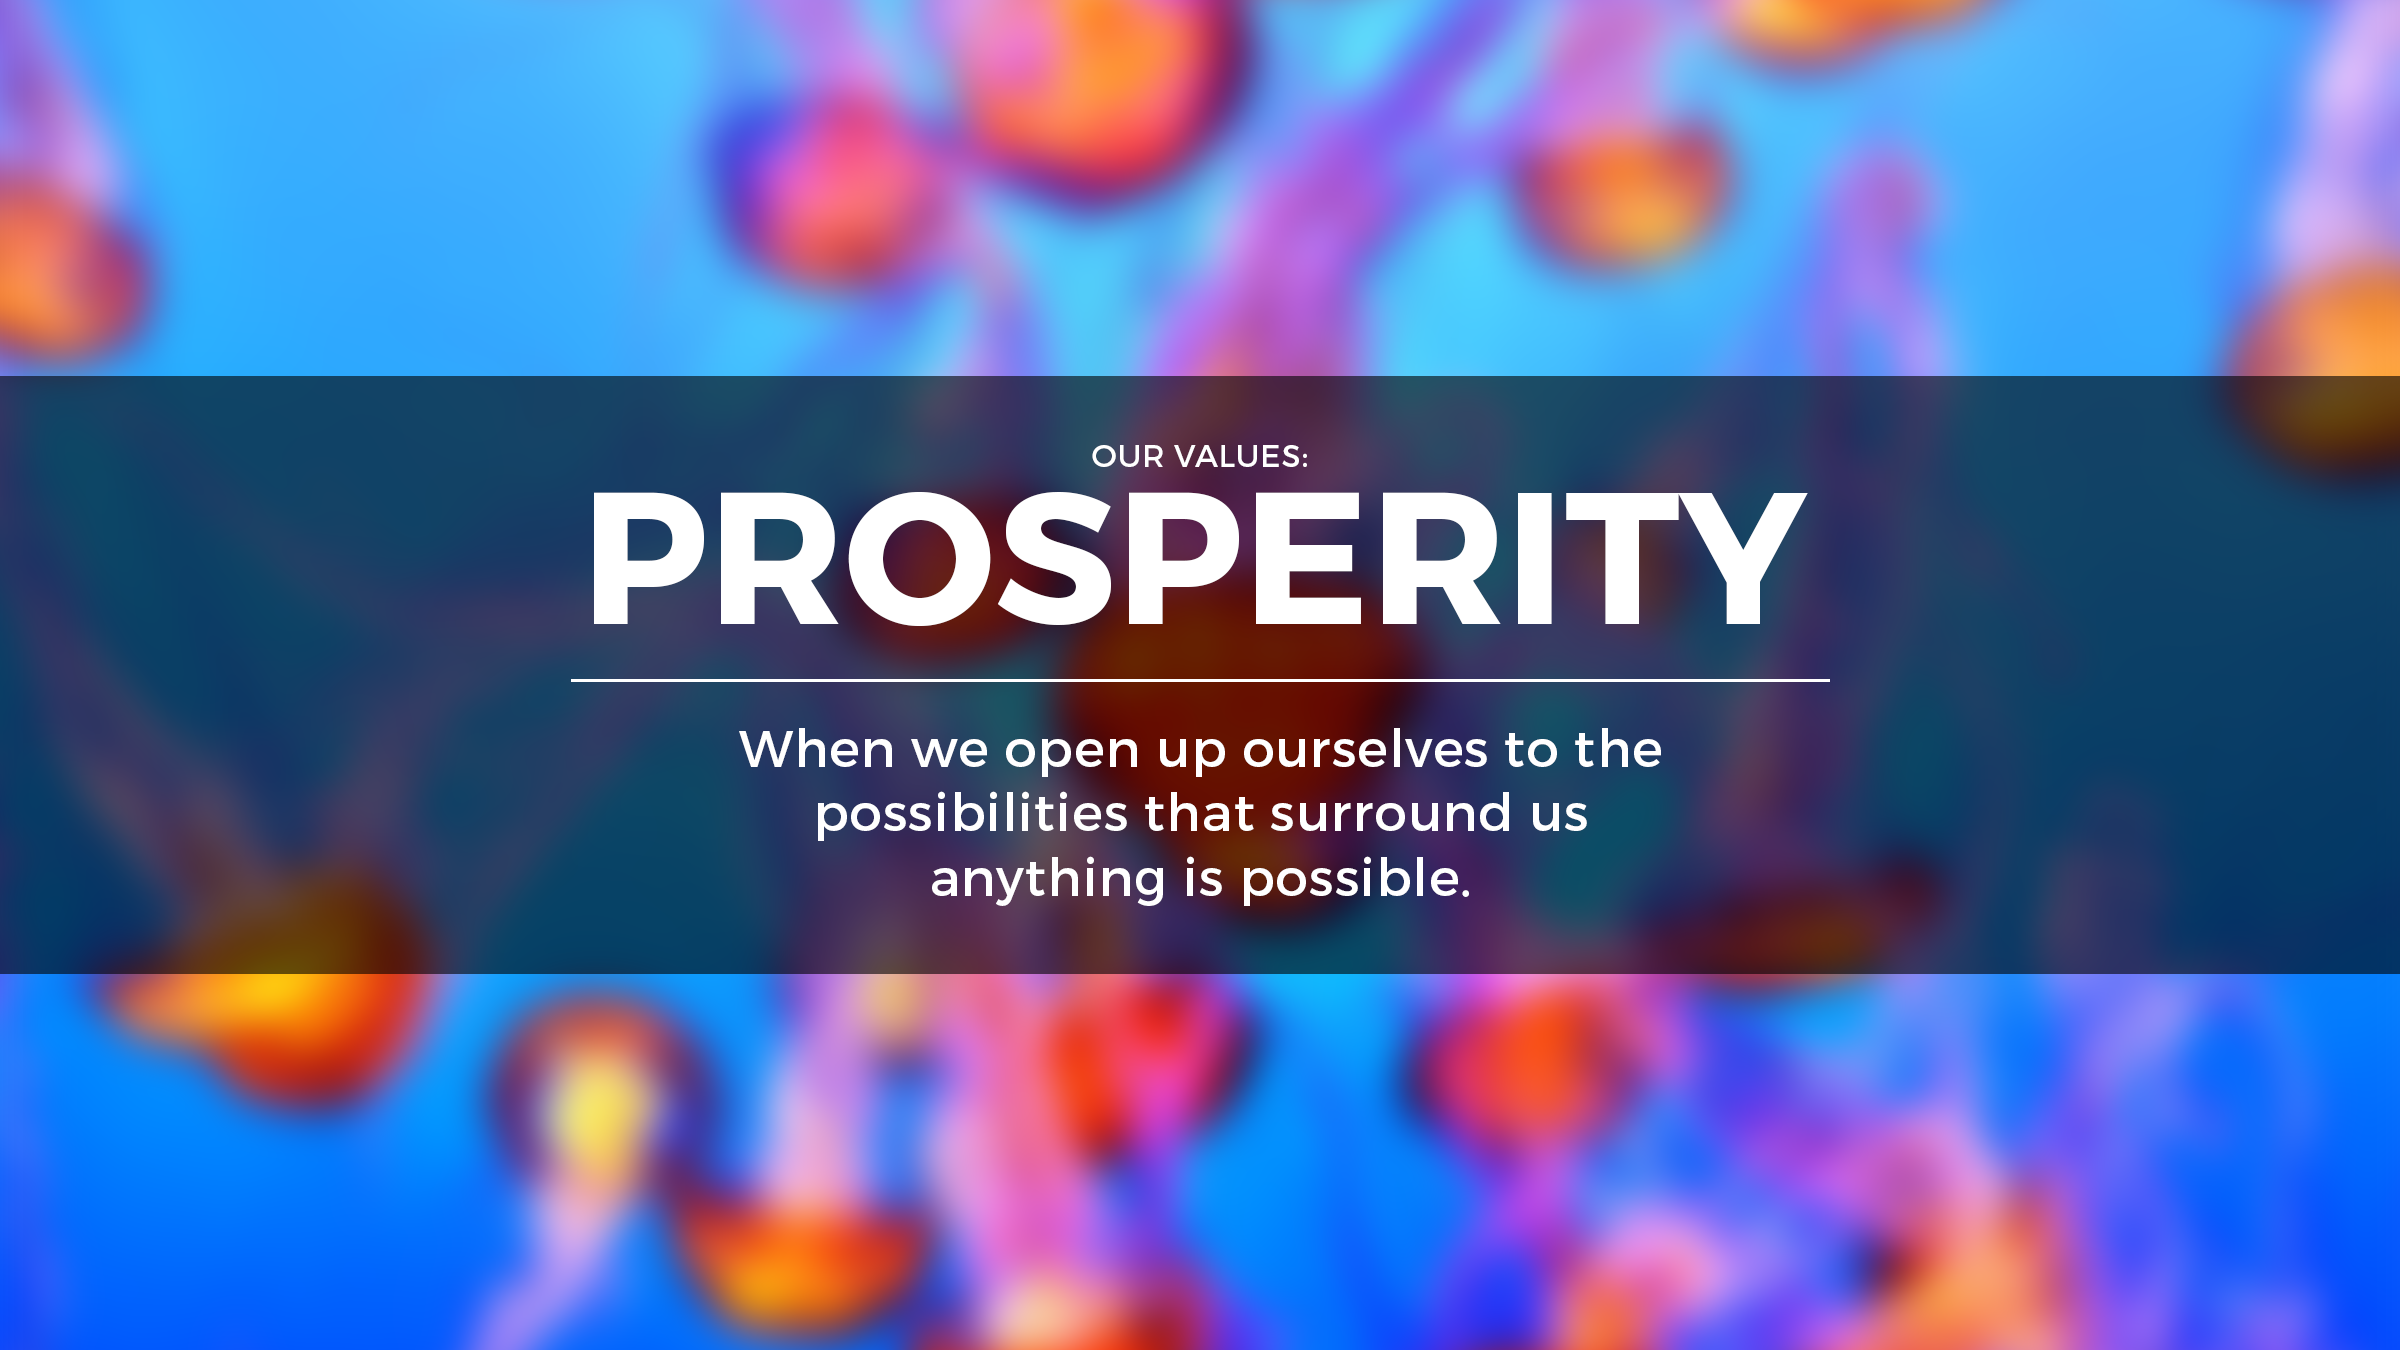 Values 3 PROSPERITY.png